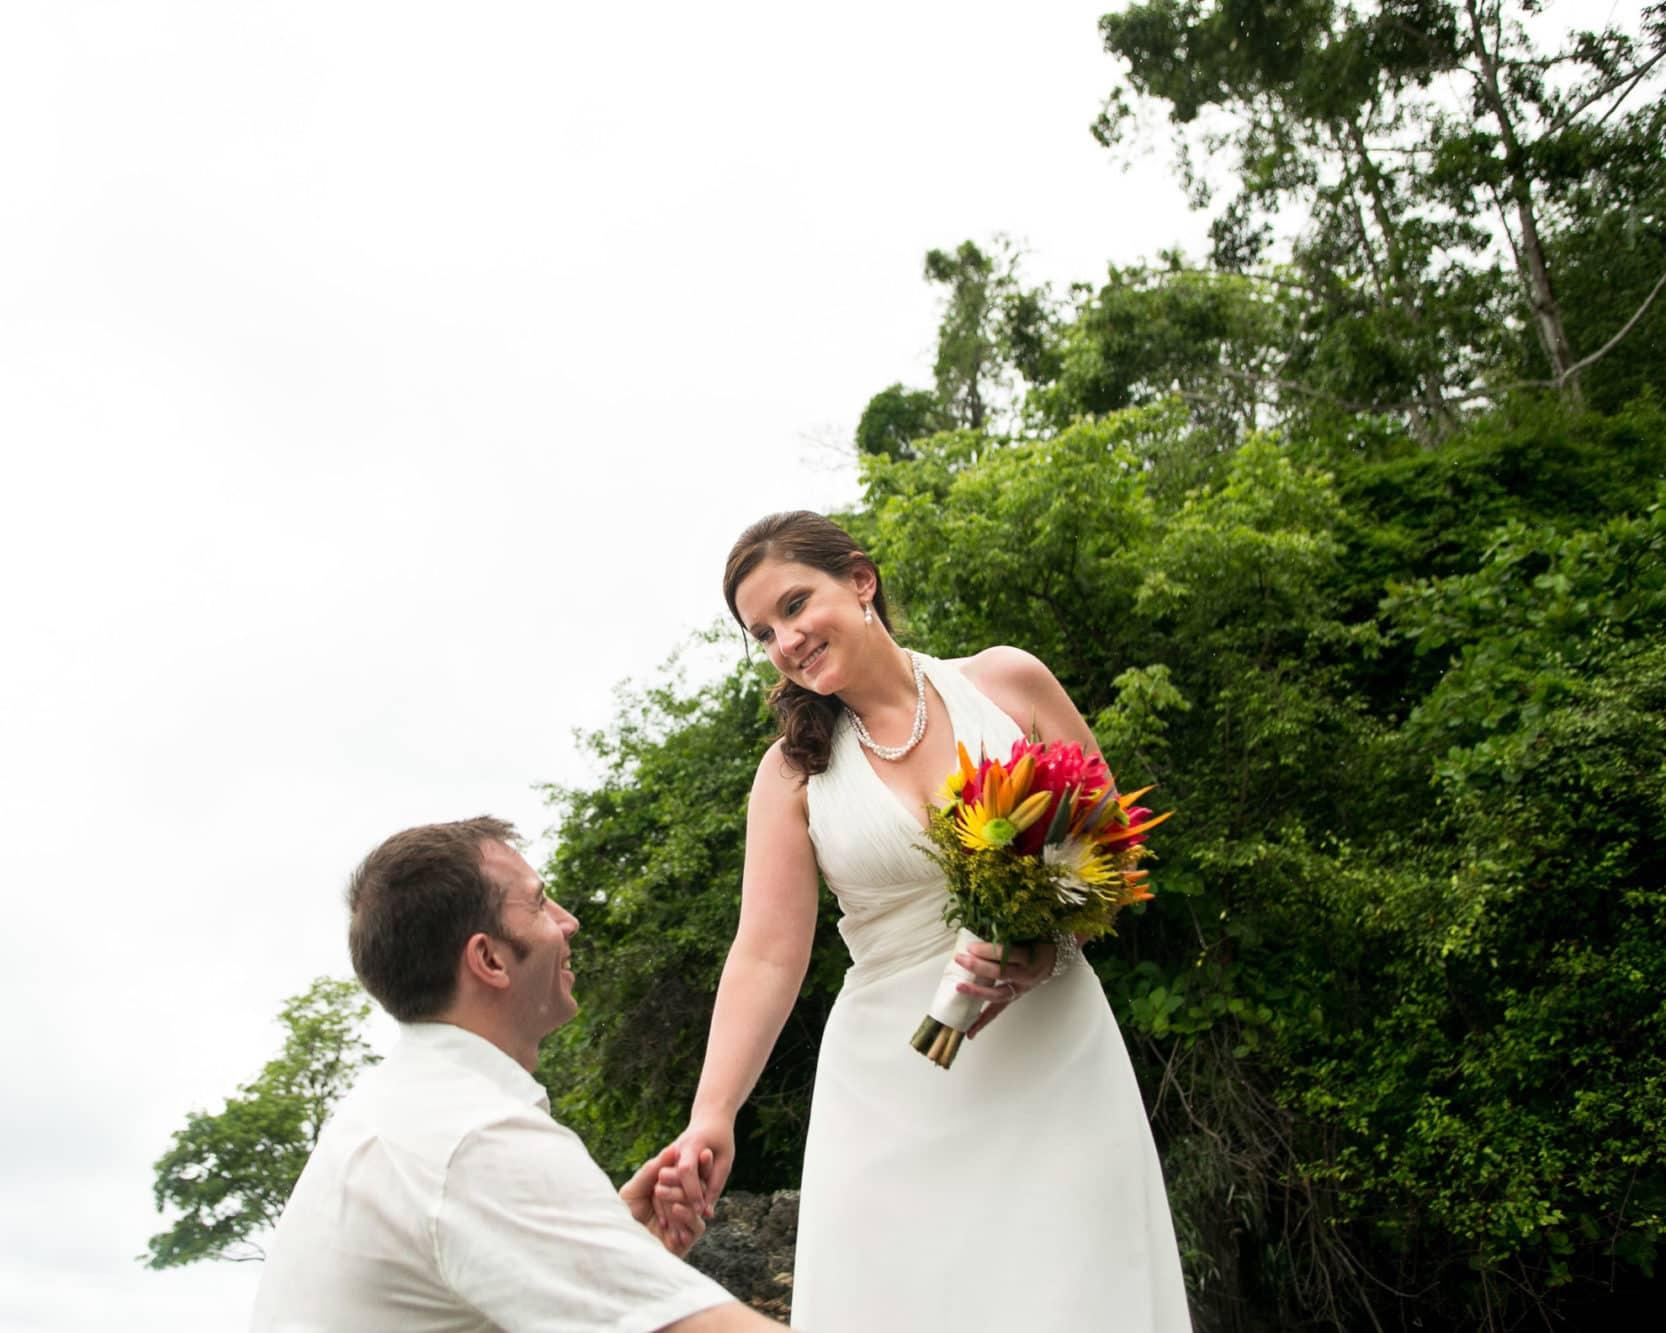 Destination wedding in Costa Rica.